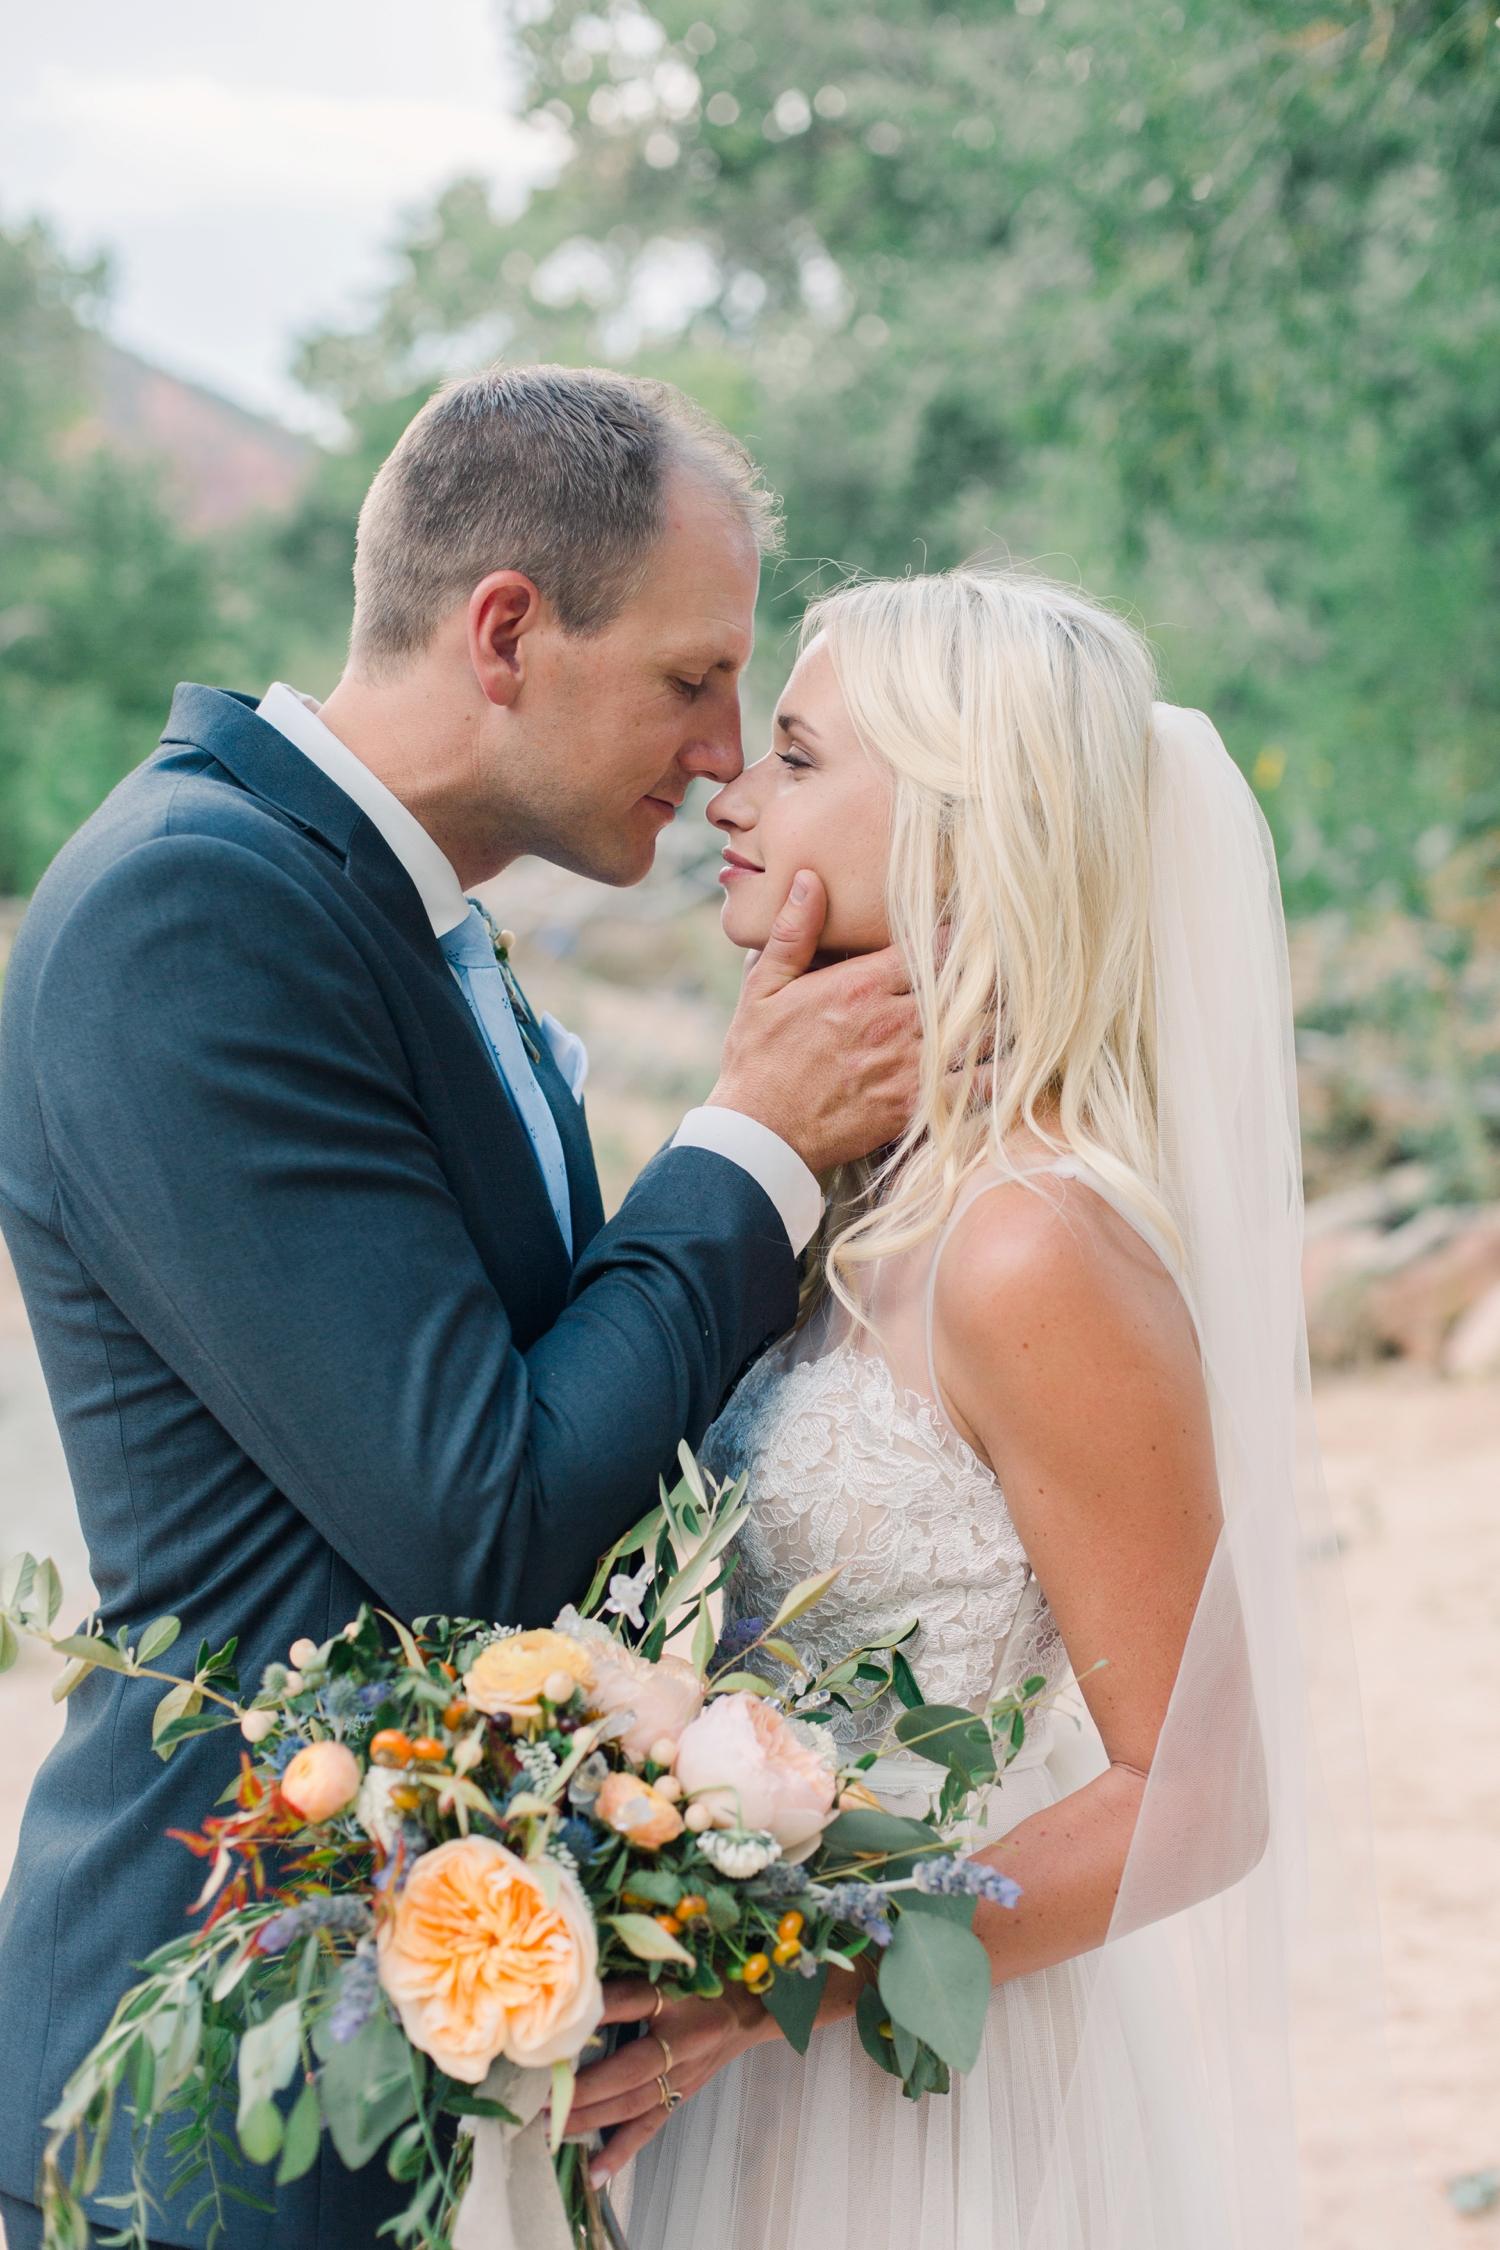 zion-wedding-photography-0022.jpg